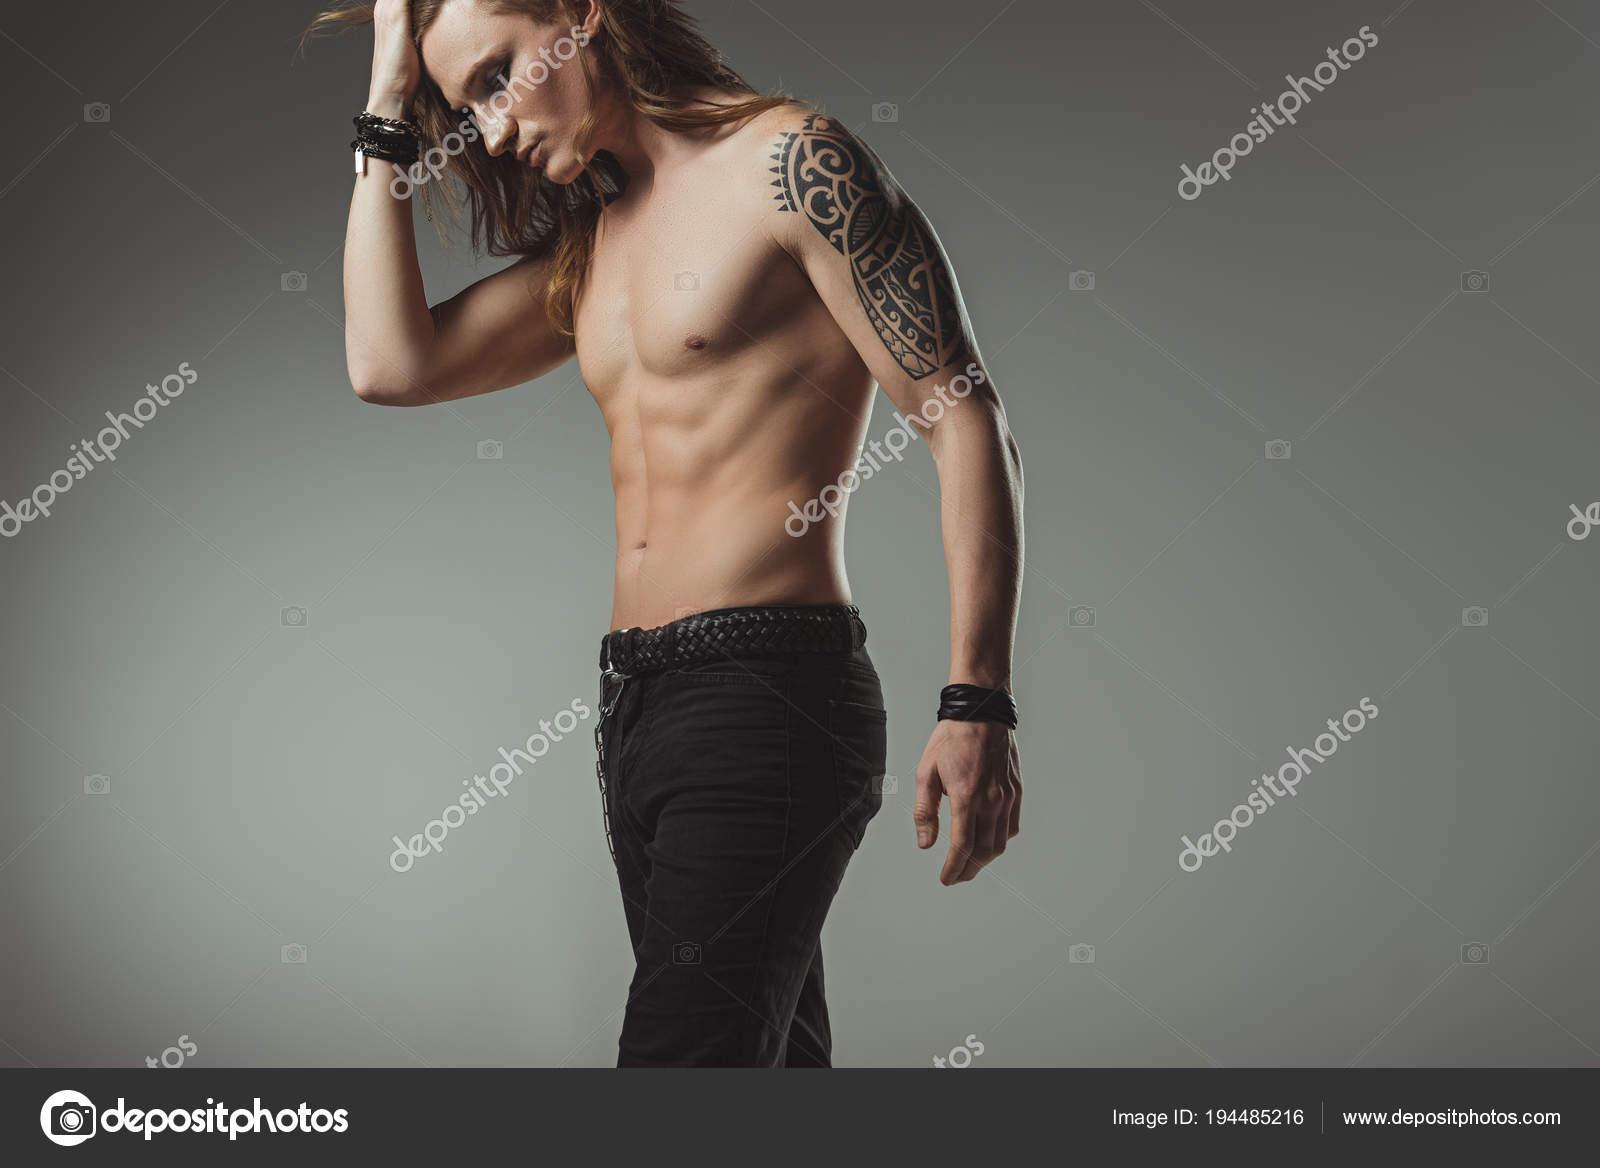 Elegante Camisa Hombre Con Tatuajes Posando Vaqueros Negro Aislados